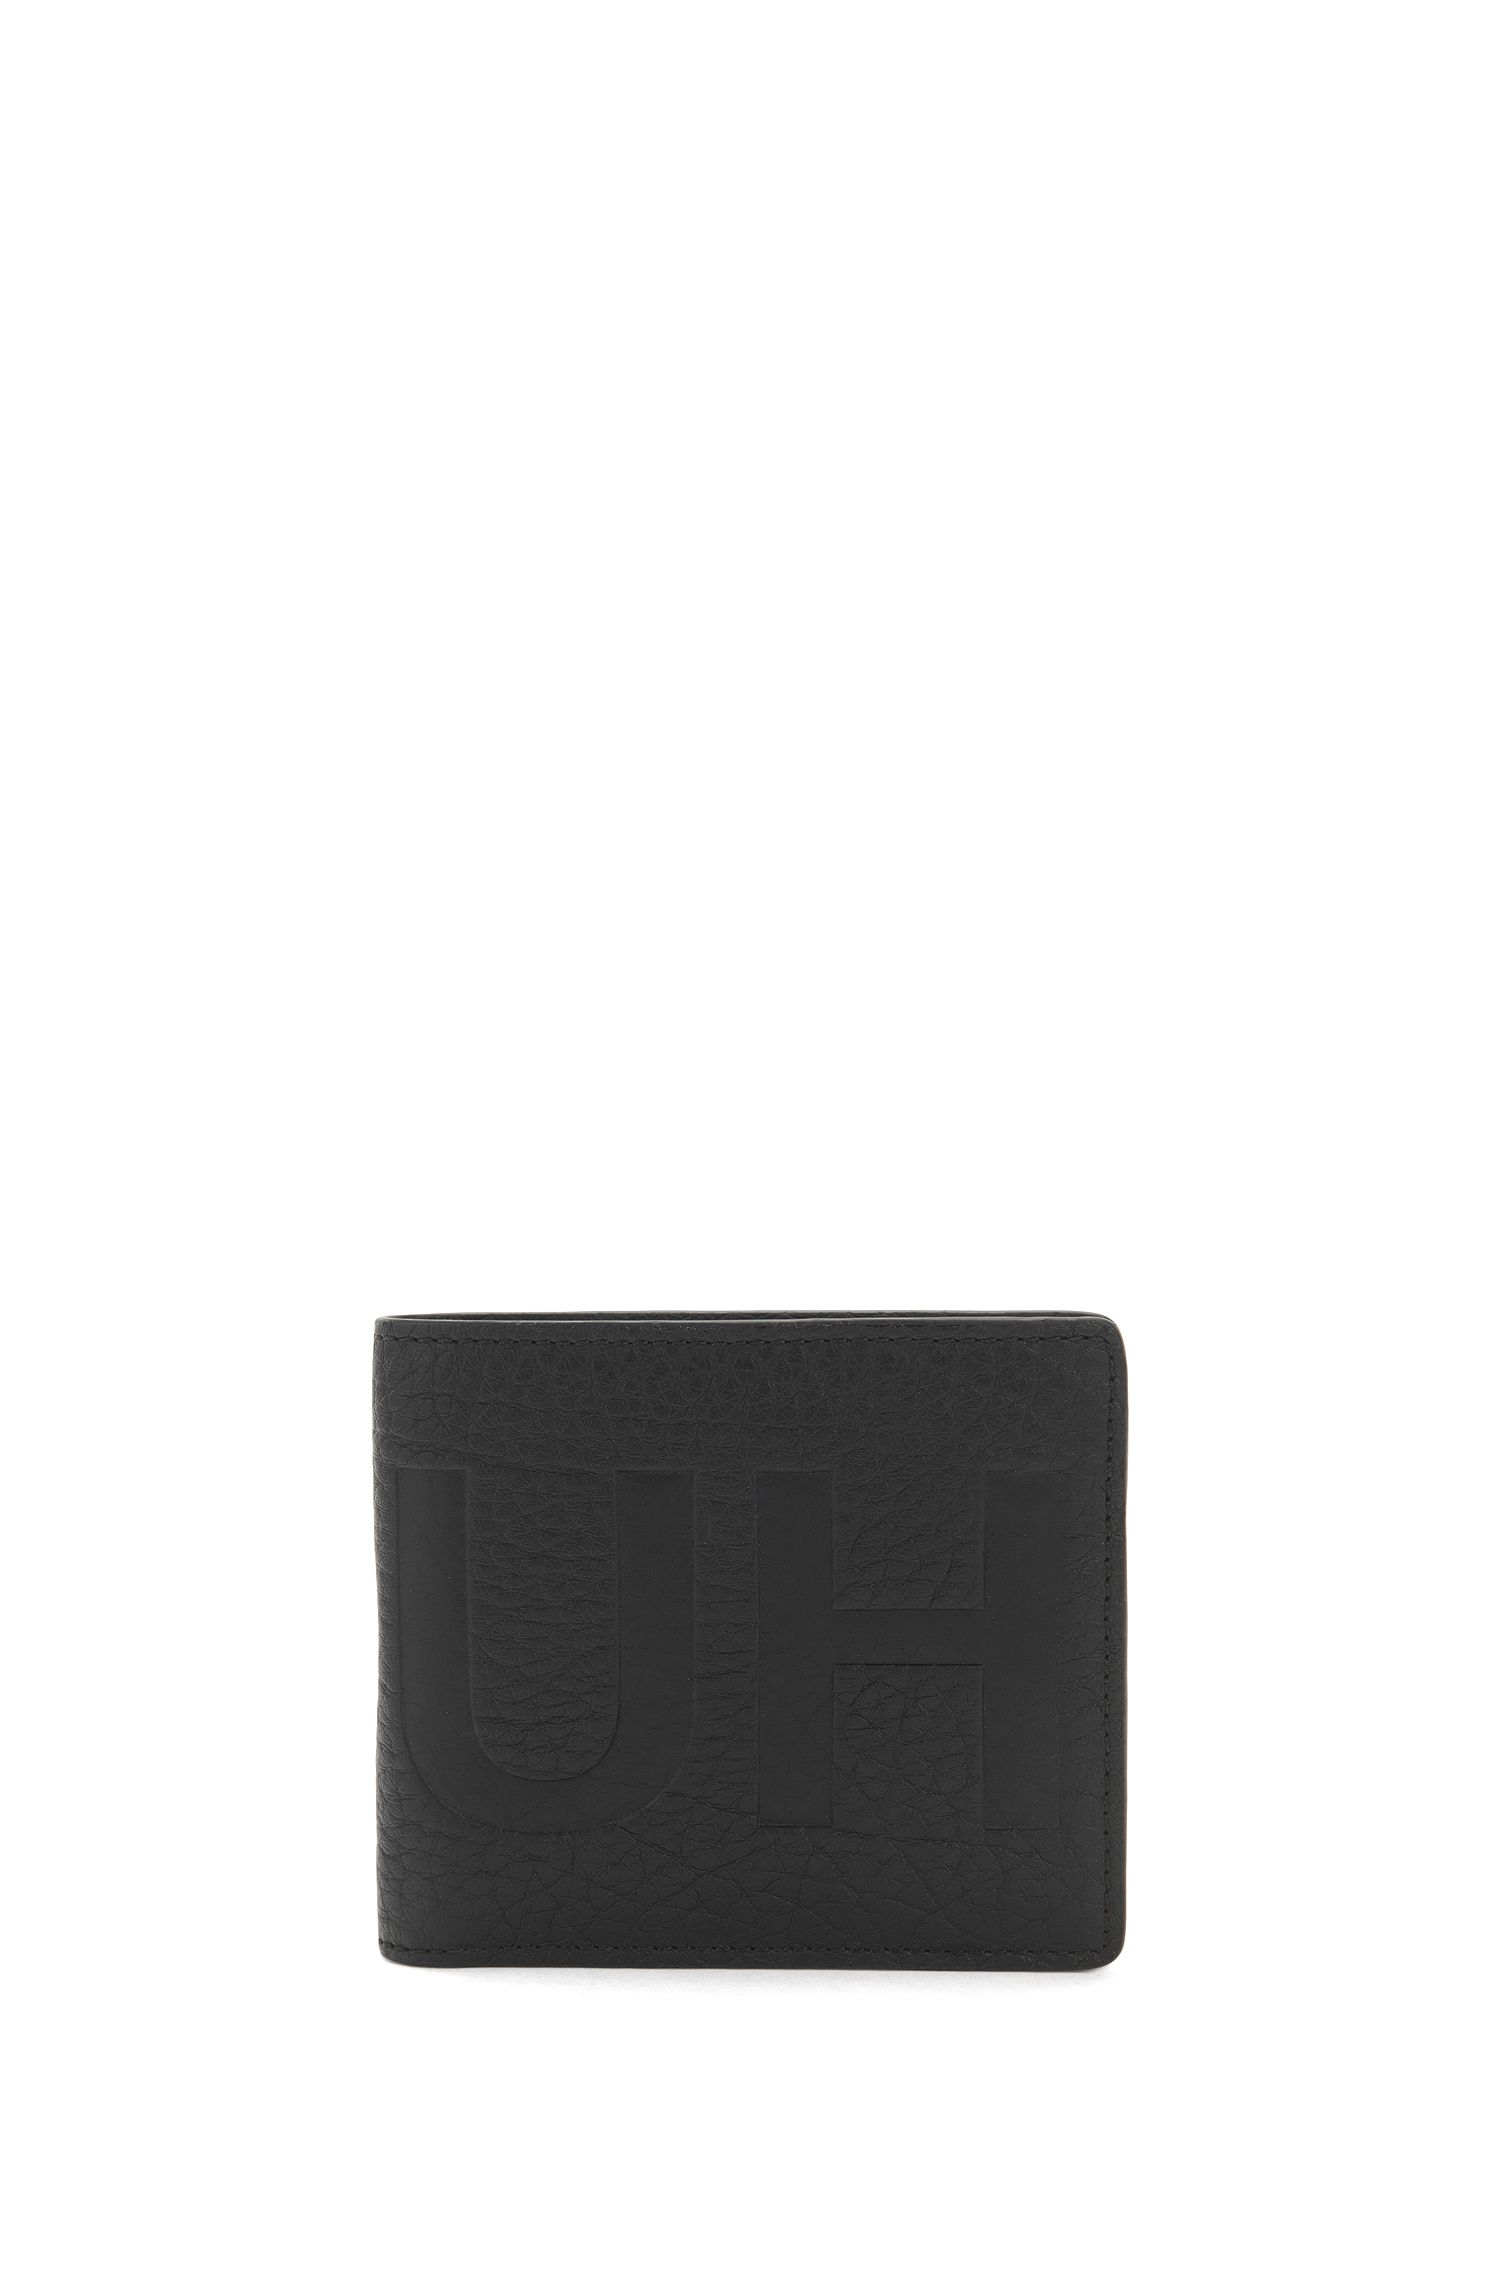 Embossed Leather Billfold Wallet | Victorian